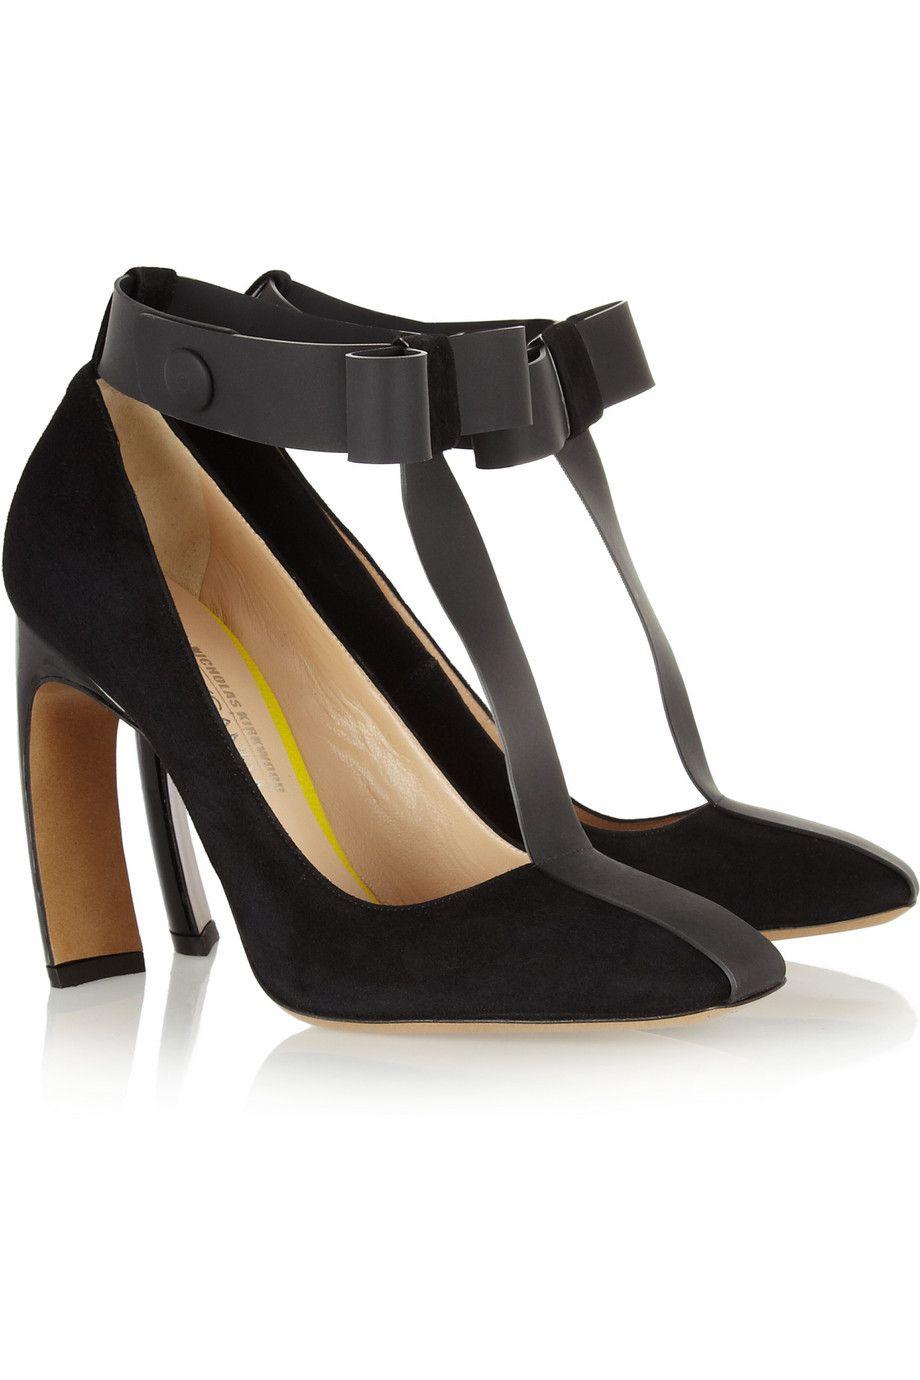 Nicholas Kirkwood Woman Lace-up Suede And Mesh Sandals Black Size 38 Nicholas Kirkwood HivVSvwUg